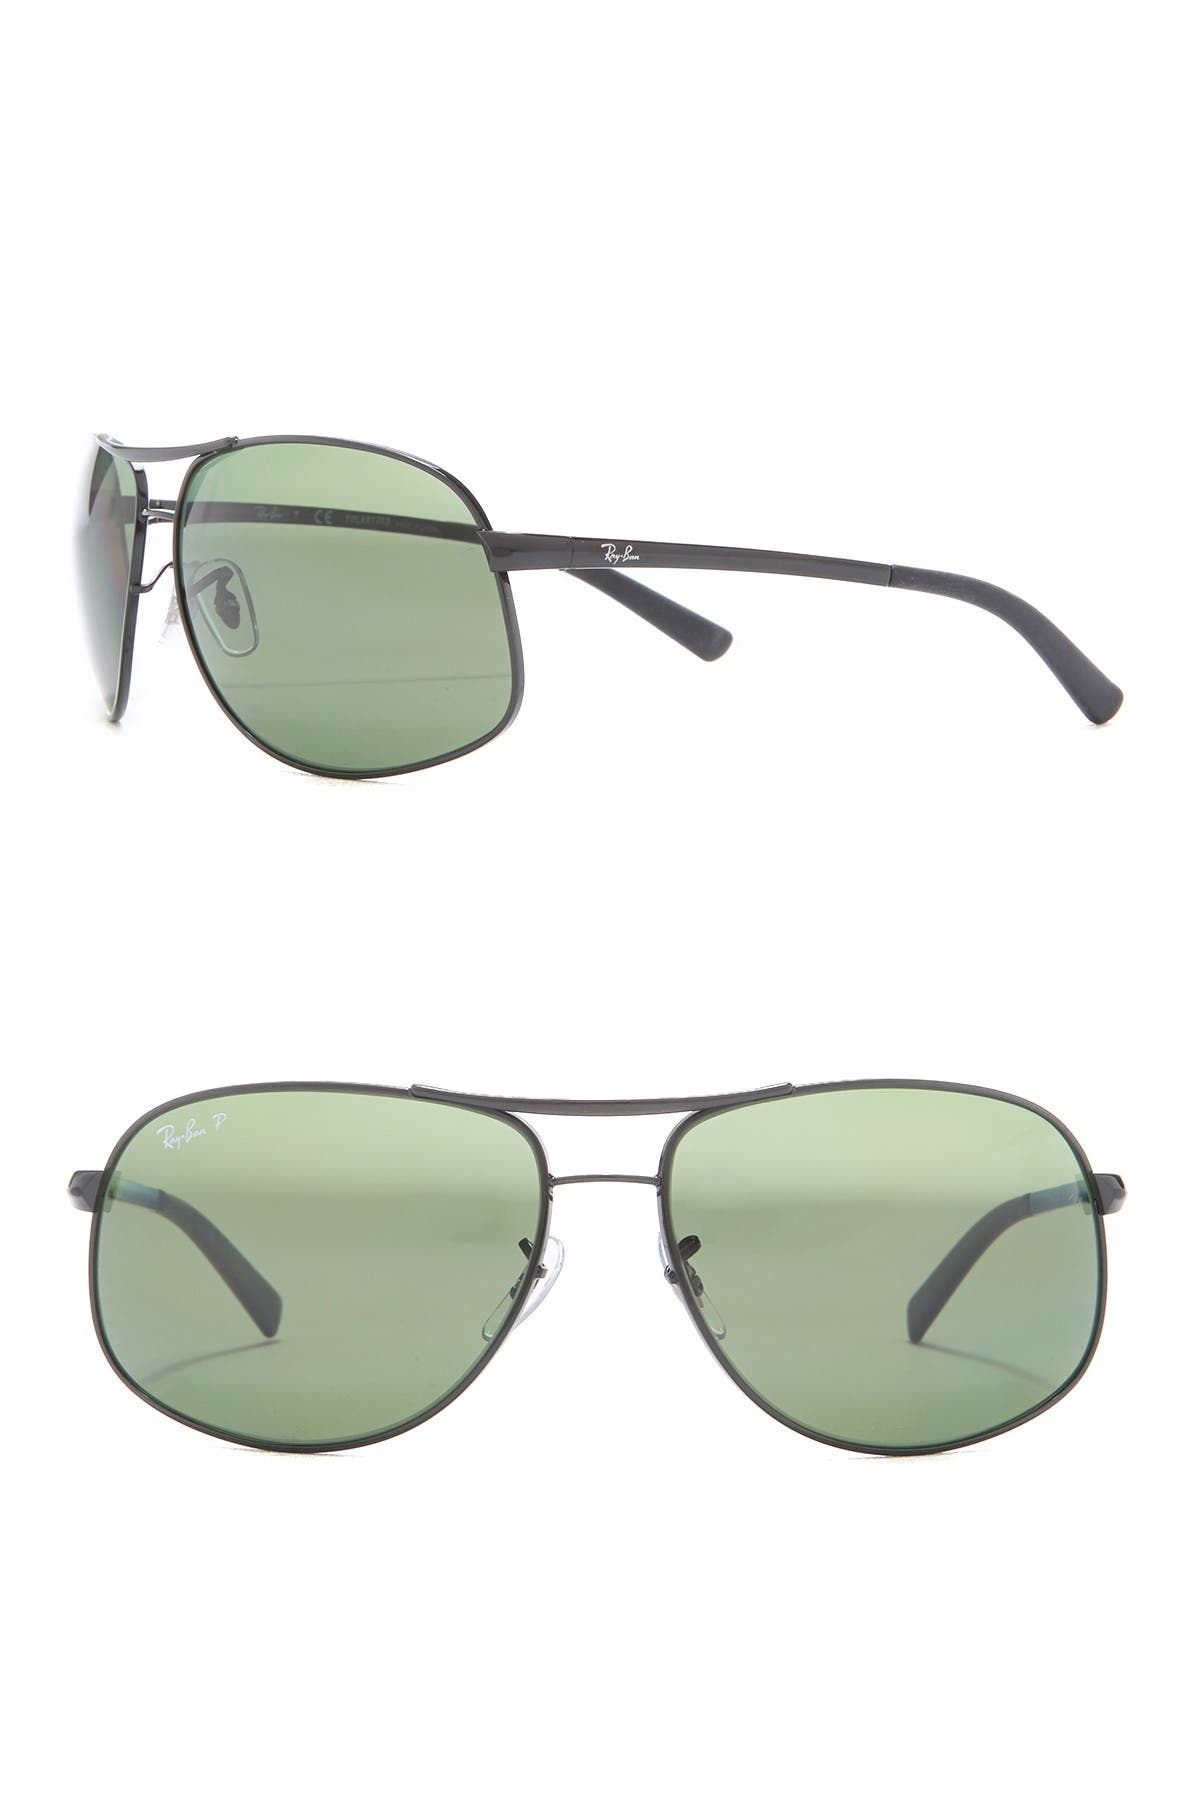 Image of Ray-Ban 64mm Pilot Polarized Sunglasses